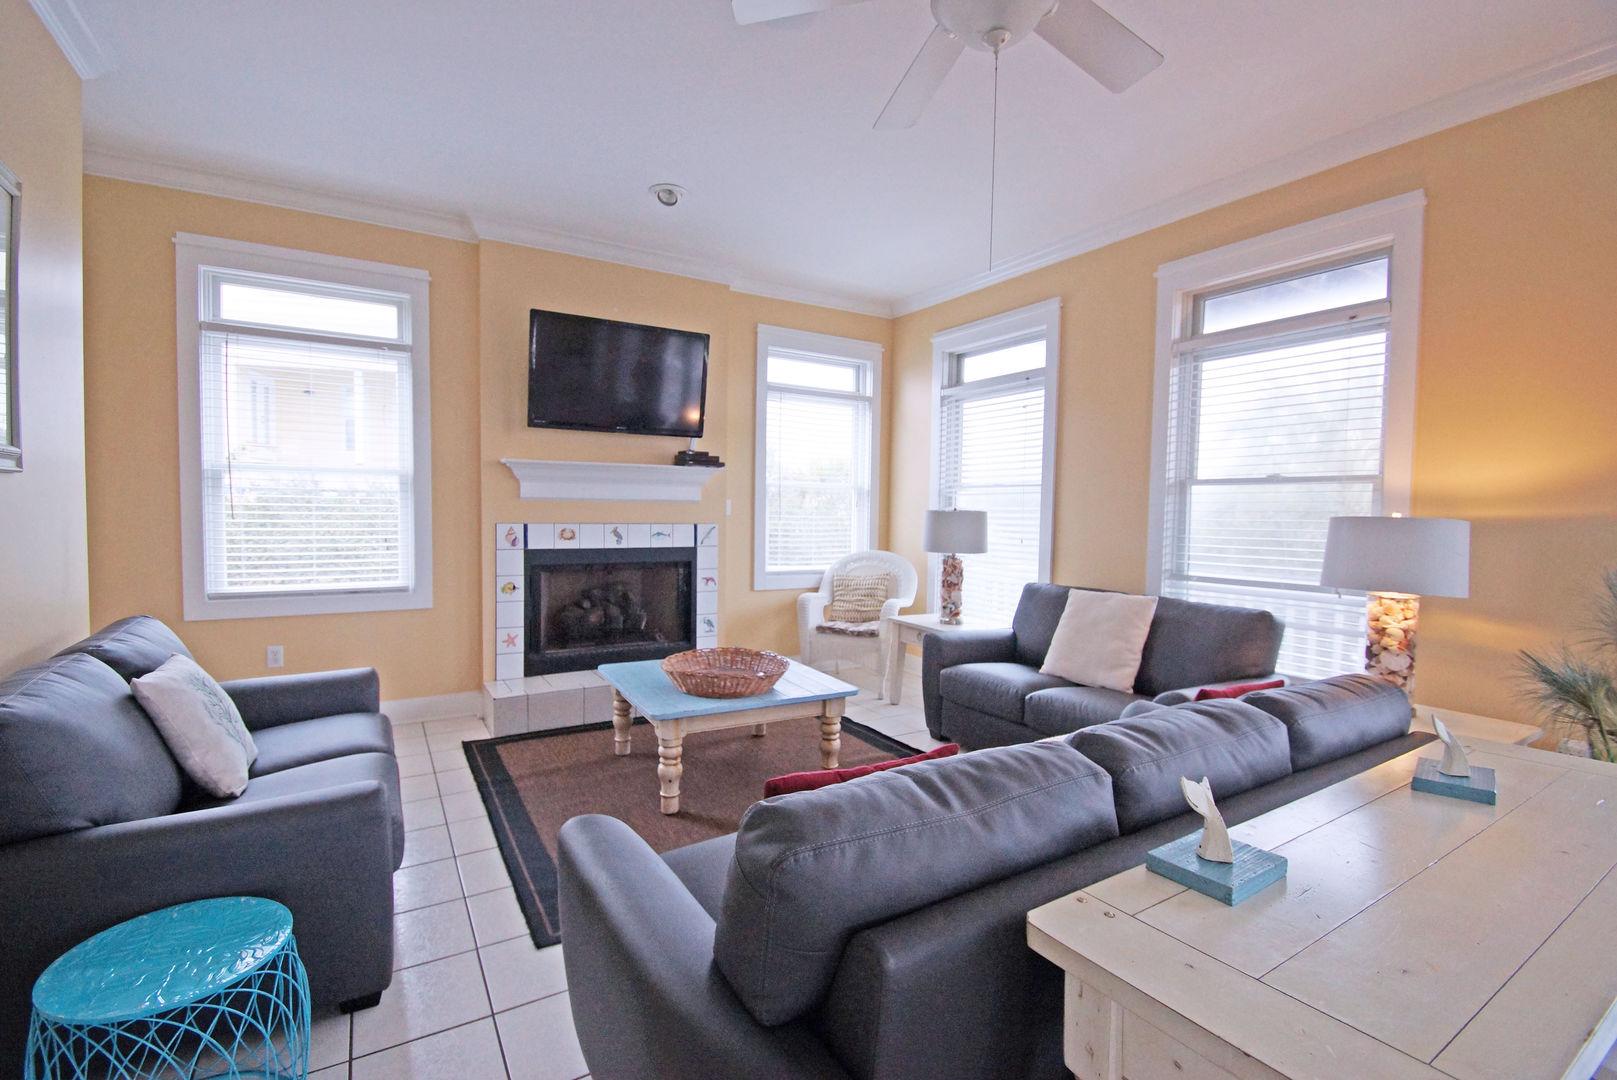 Sofas, Coffee Table, Fireplace, Sofa Table, TV, and Windows.